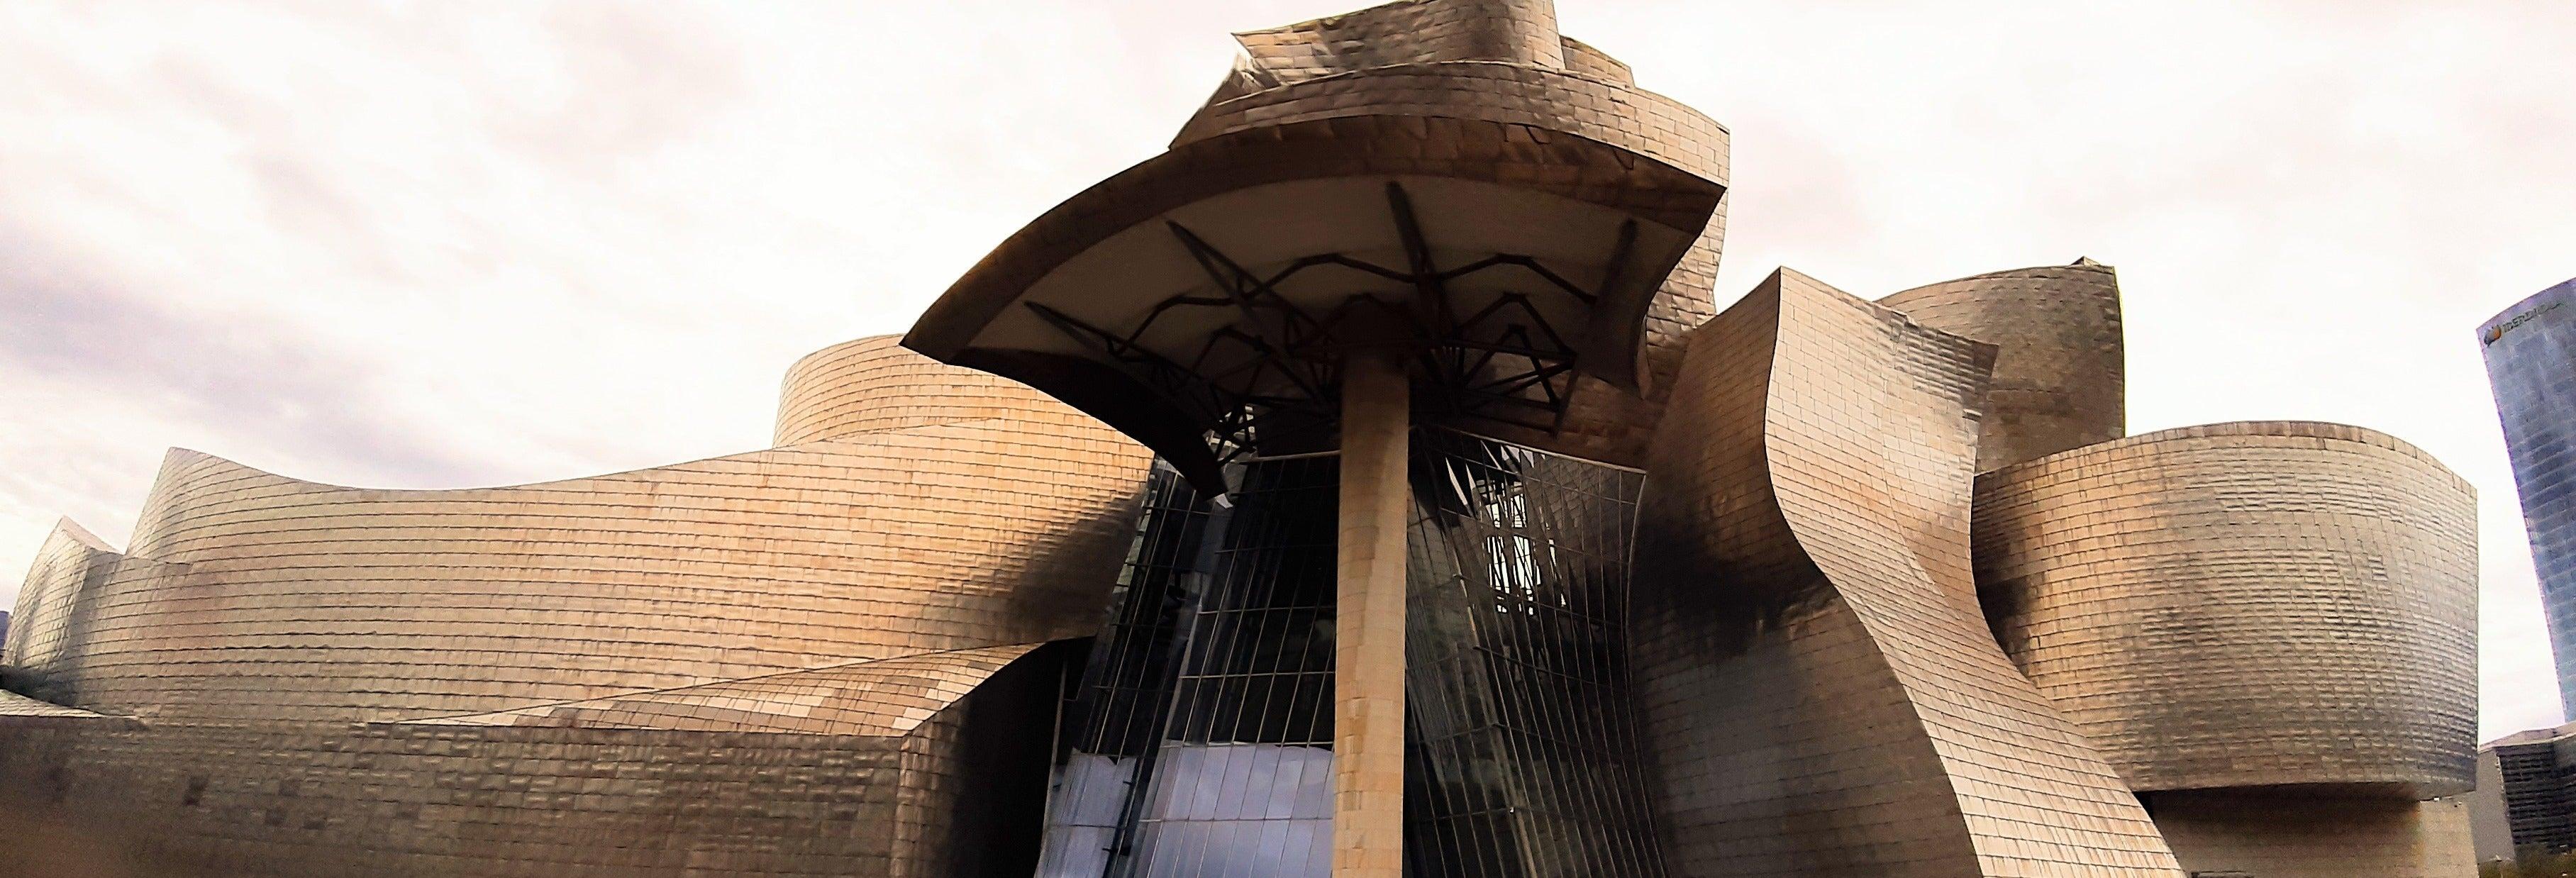 Visita guiada pelo Museu Guggenheim Bilbao